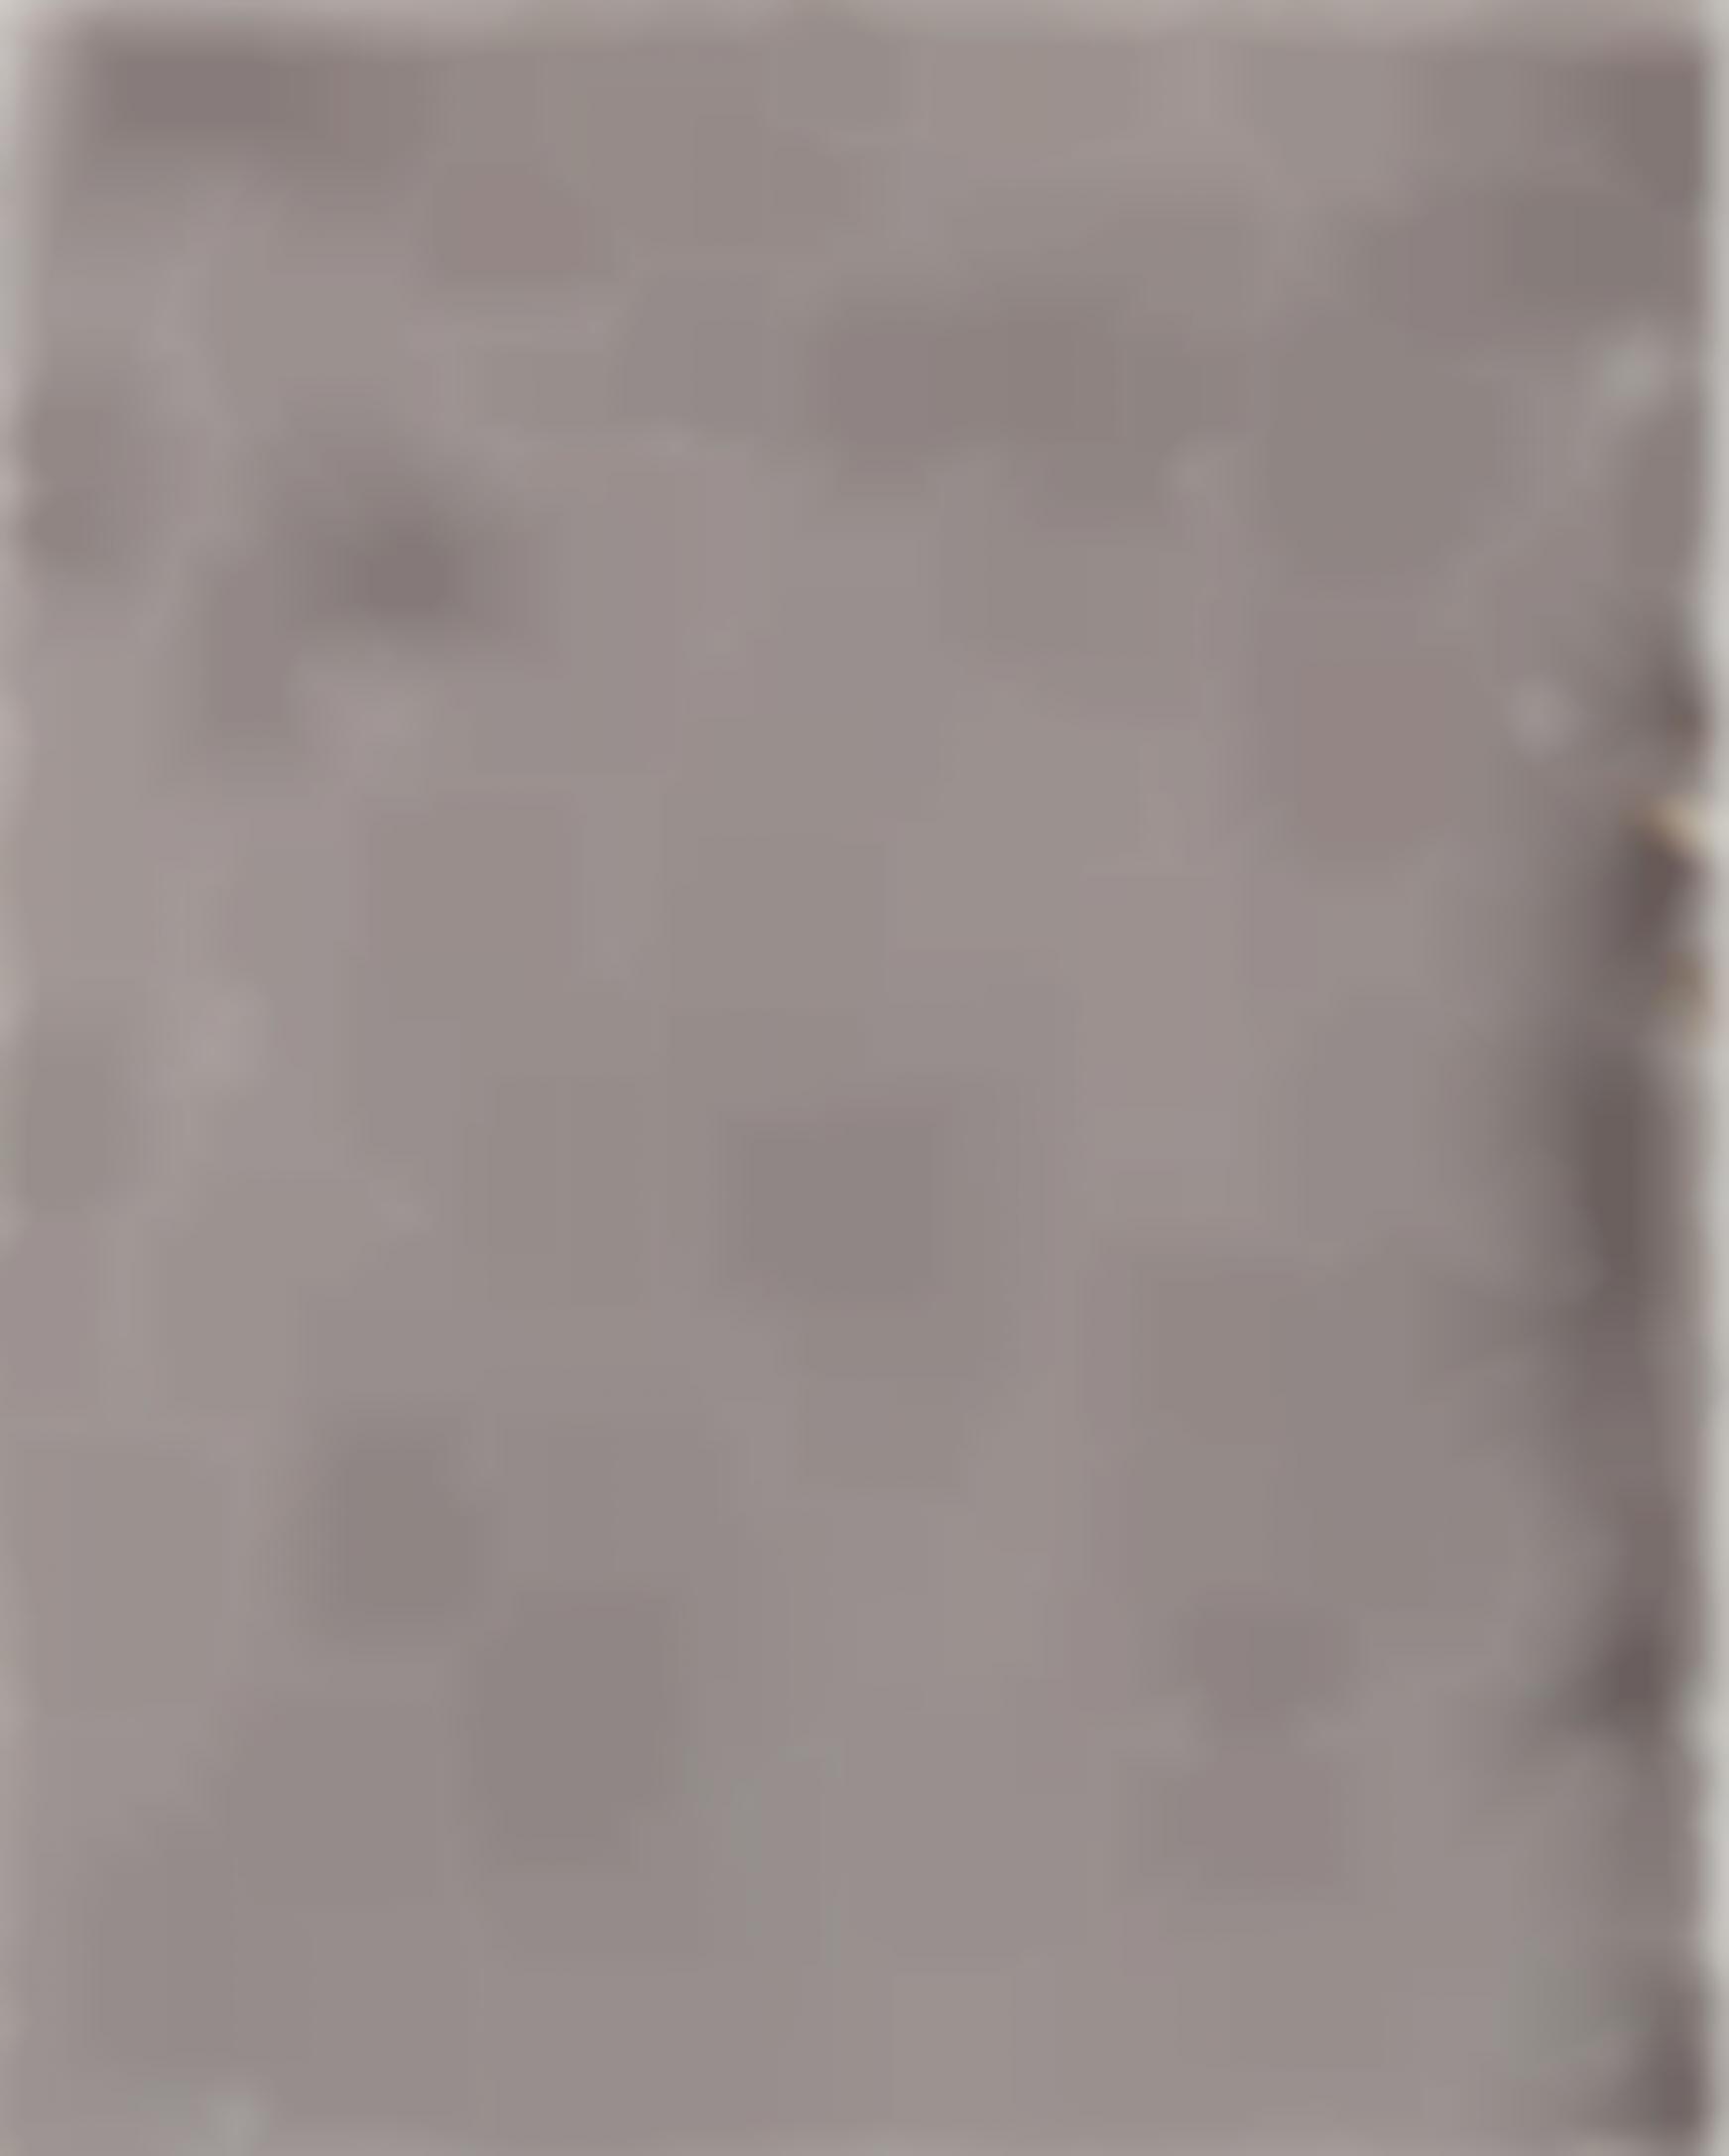 Ryan Estep-Sterilized Dirt B12-2014